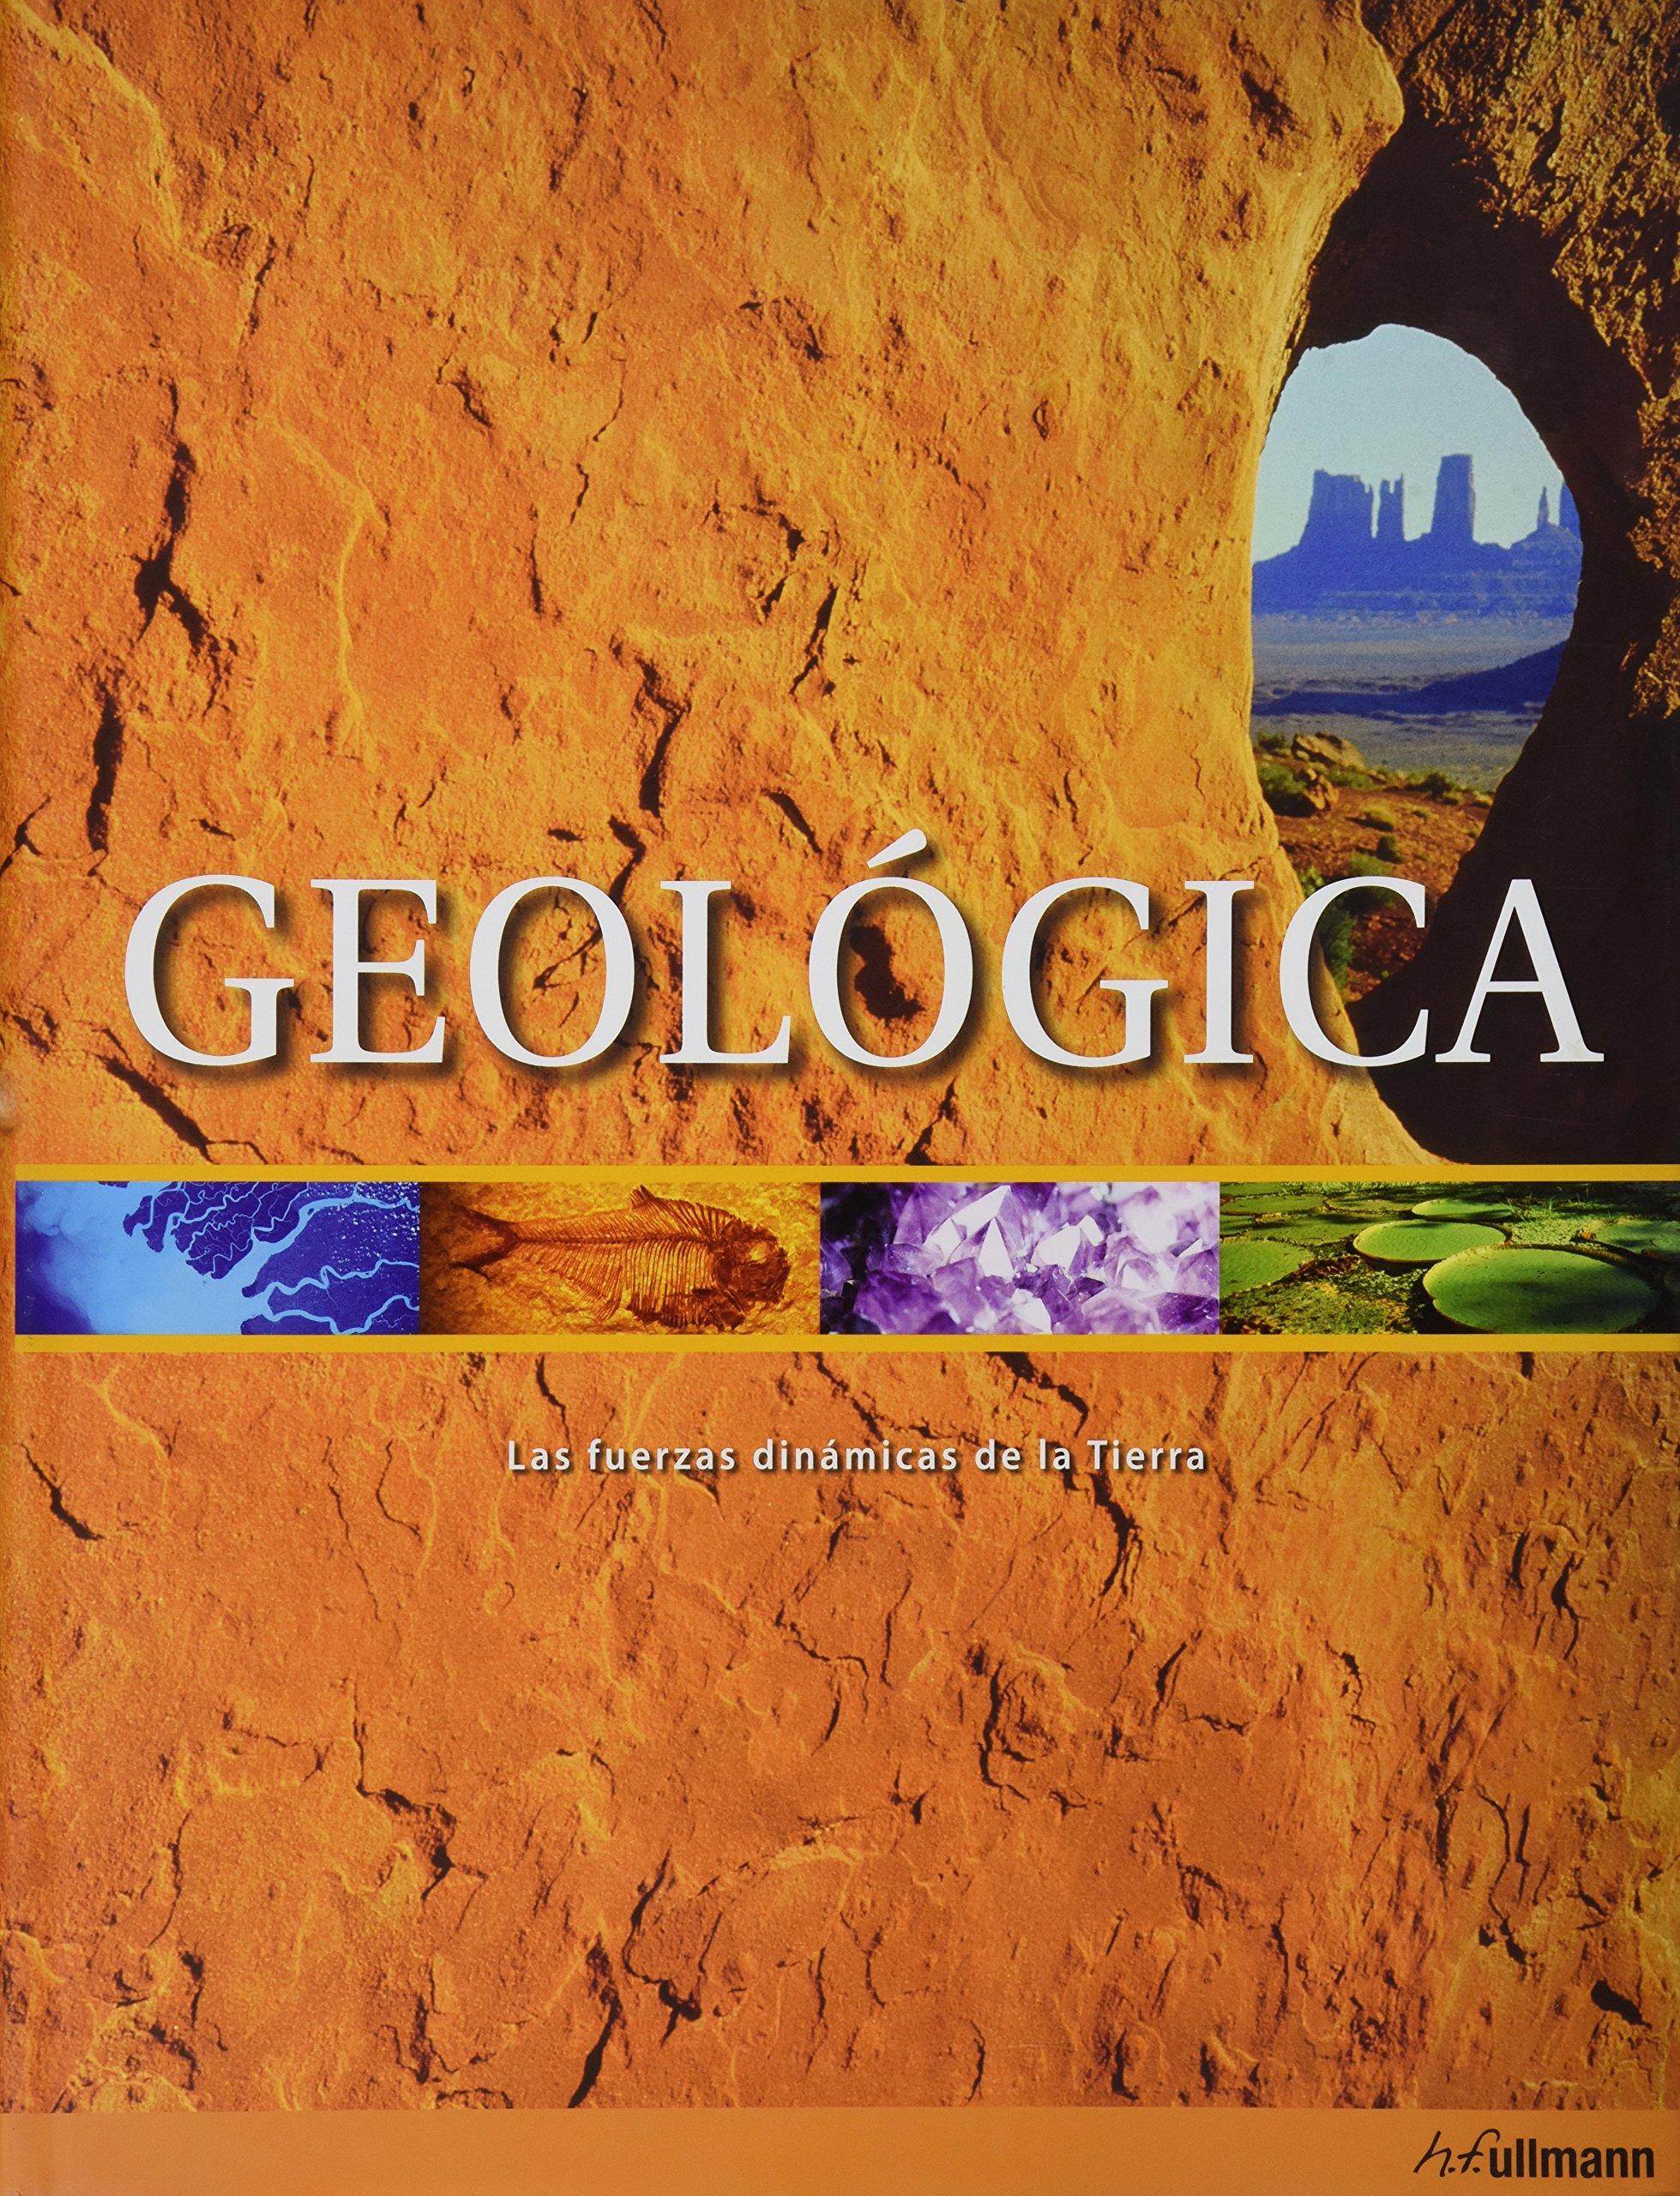 GEOLOGICA: Amazon.es: R. Coenraads, Robert, Koivula, J.: Libros